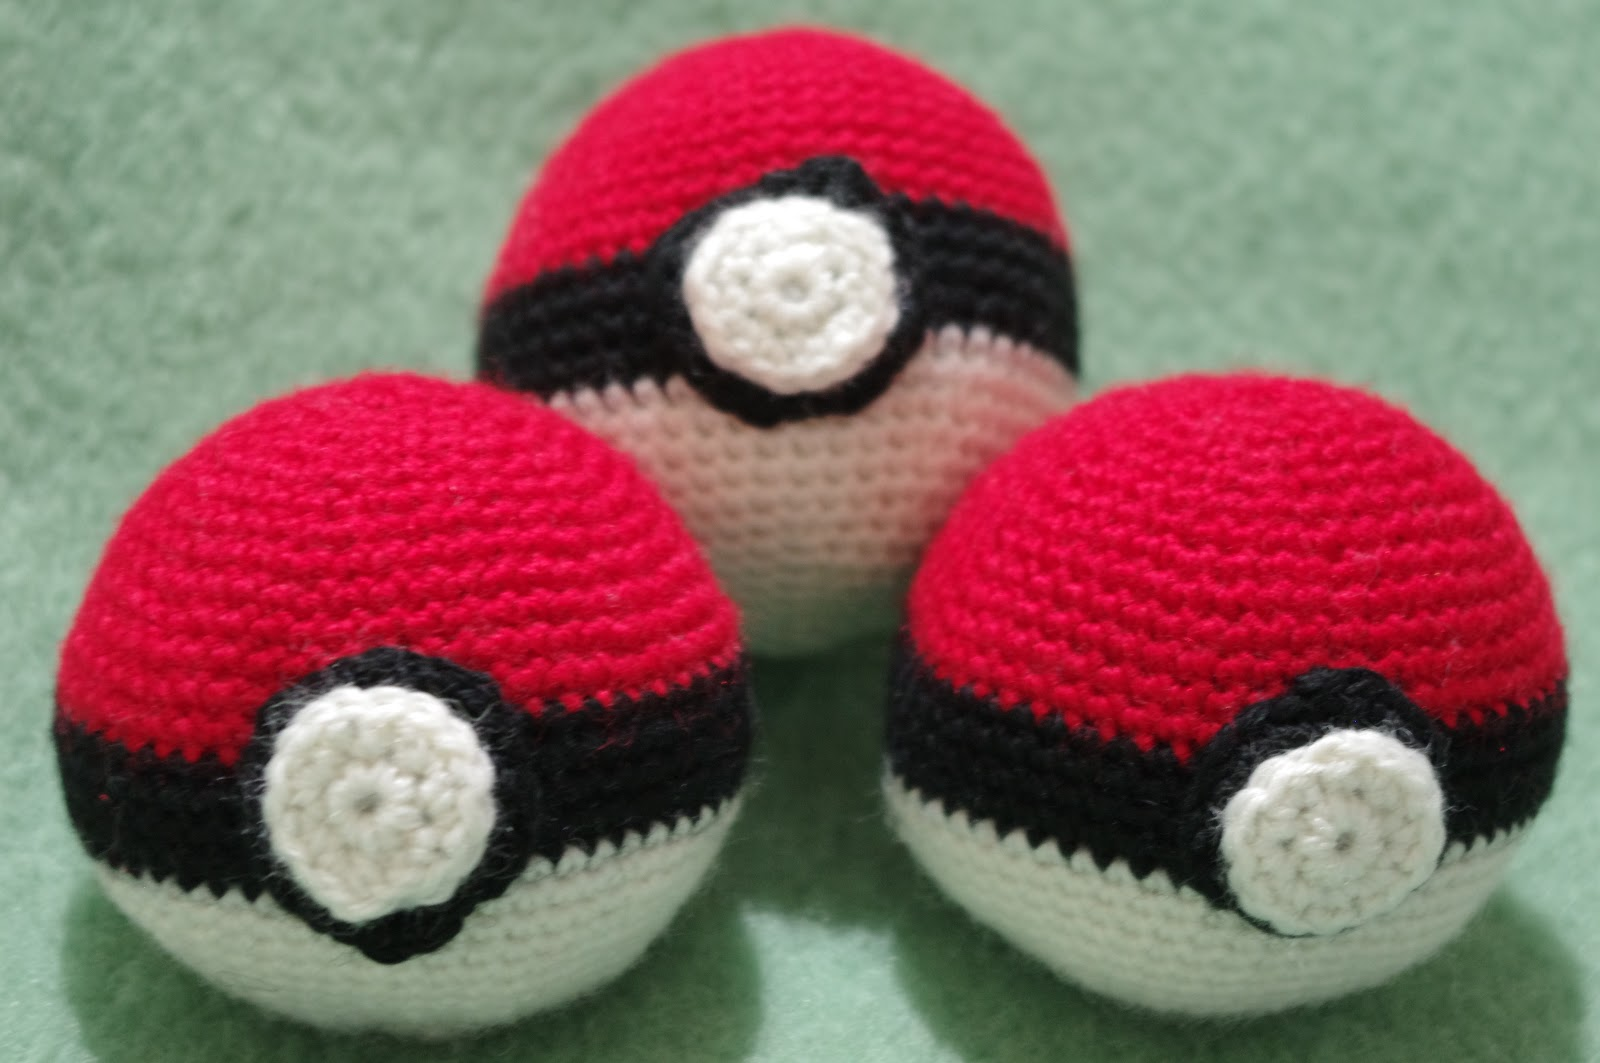 Pokeball Amigurumi : Froda Creazioni: Amigurumi: Pokeball